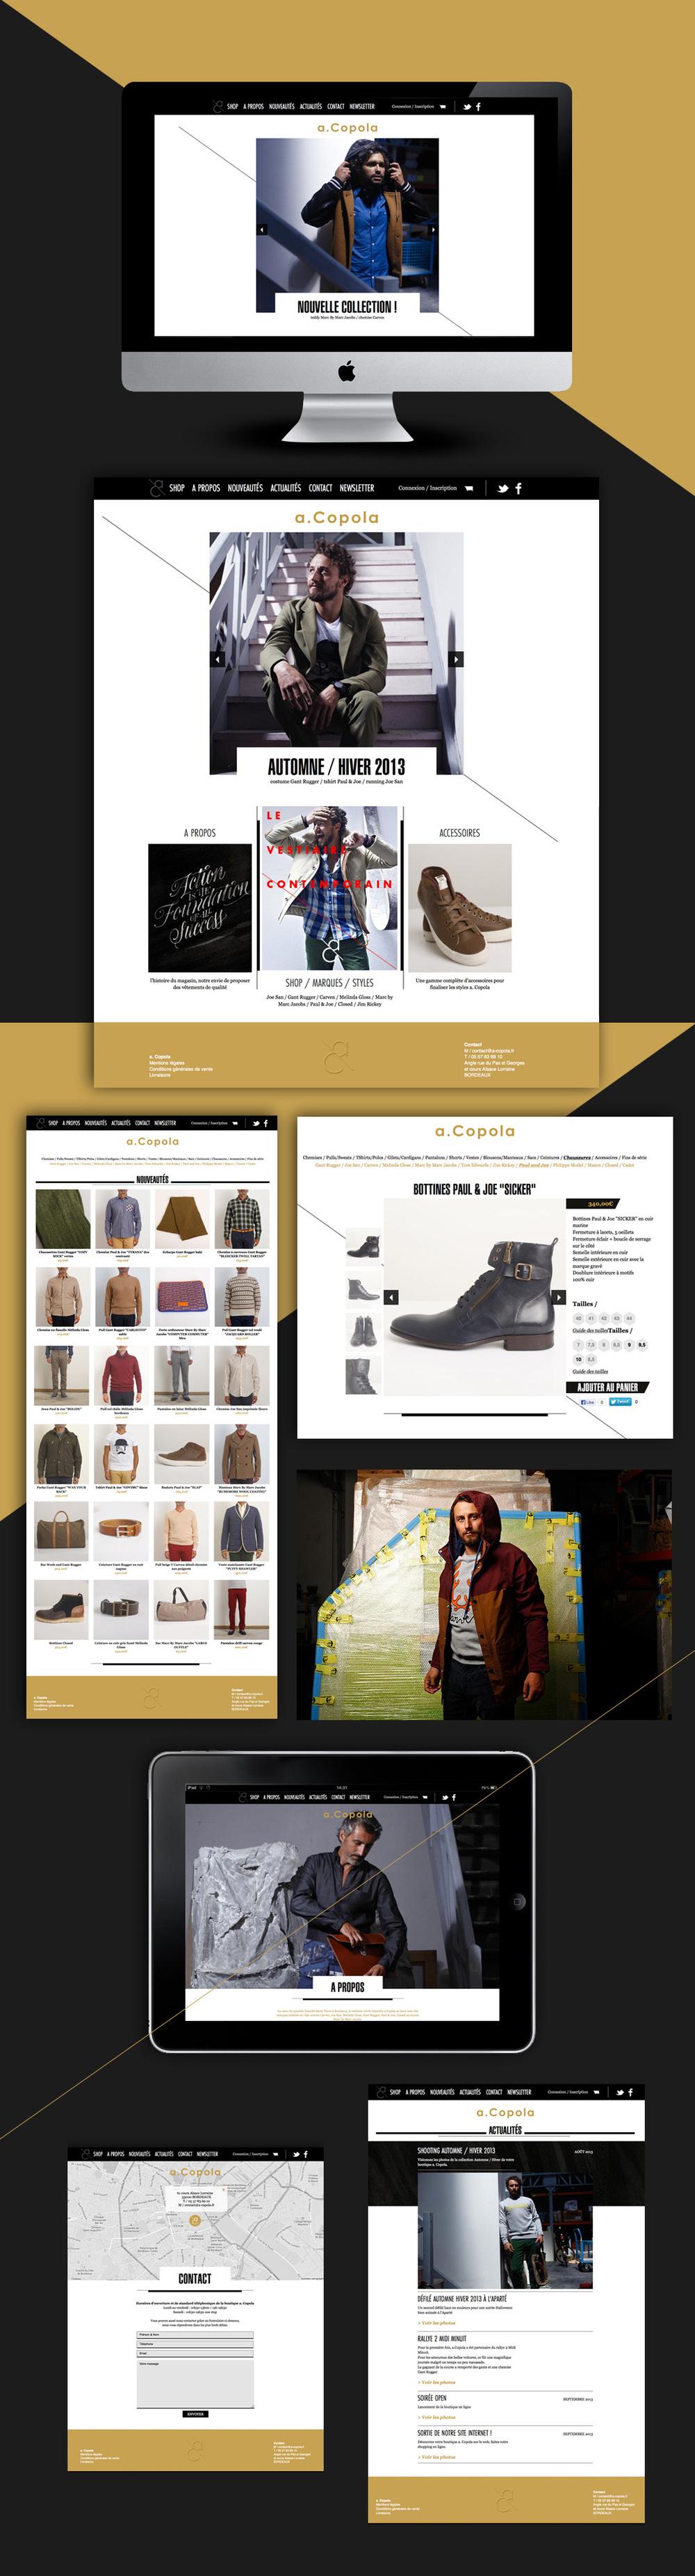 presentation-site-a-copola.jpg